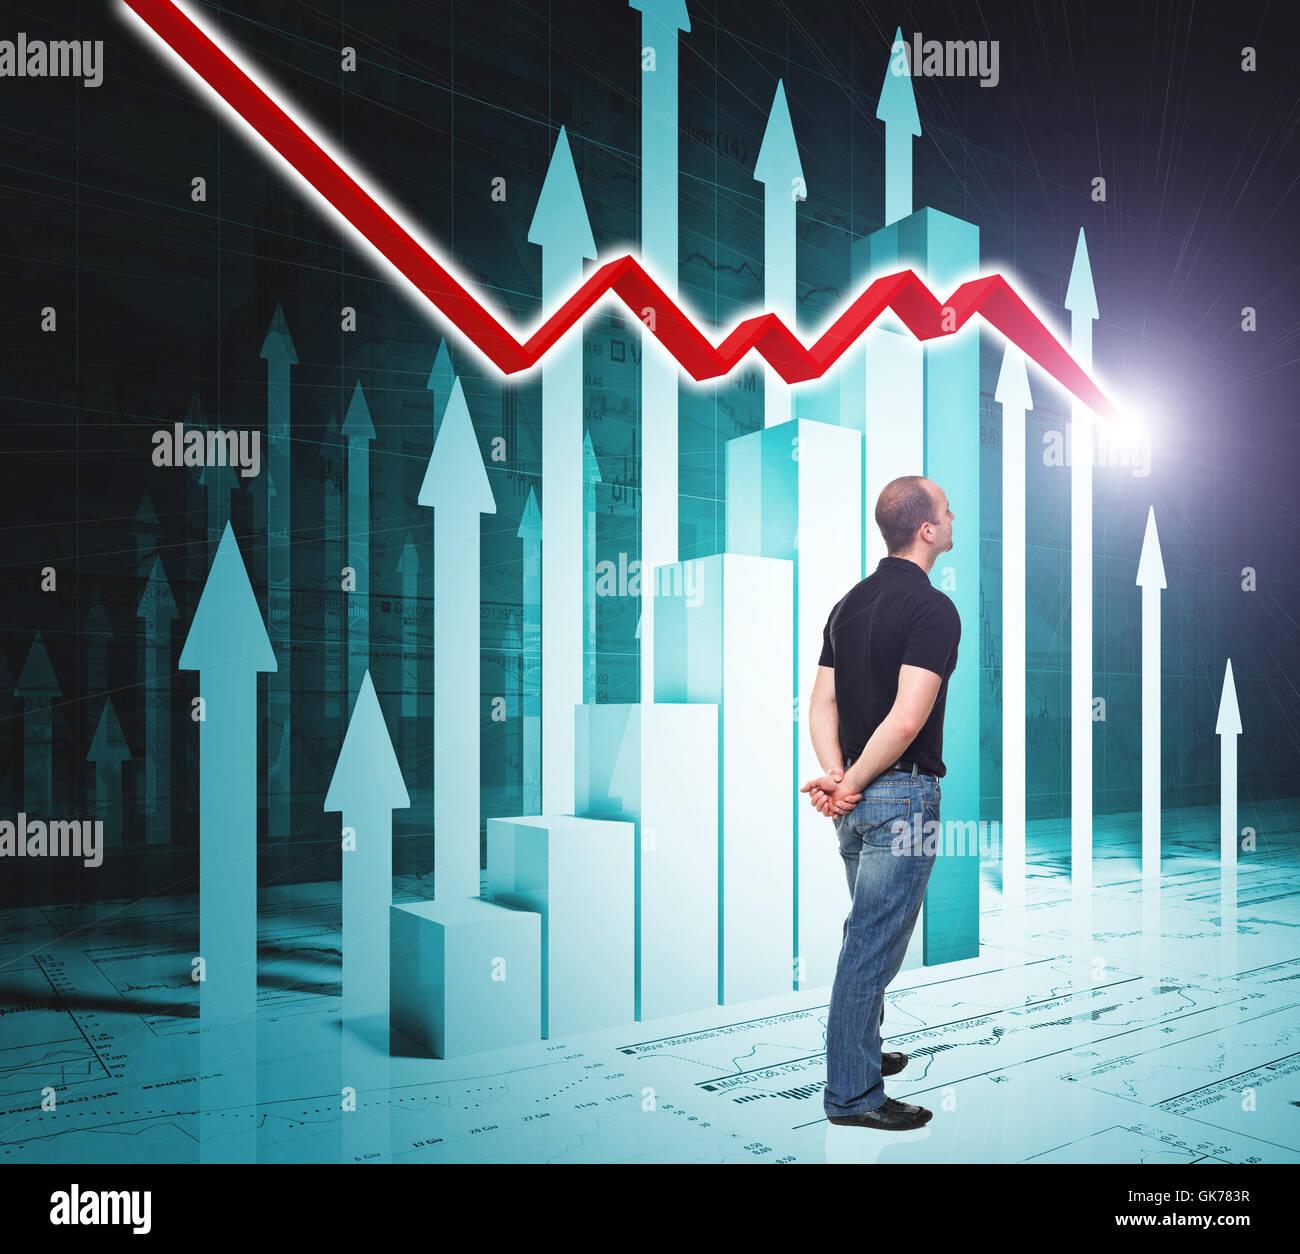 recession grow improve - Stock Image